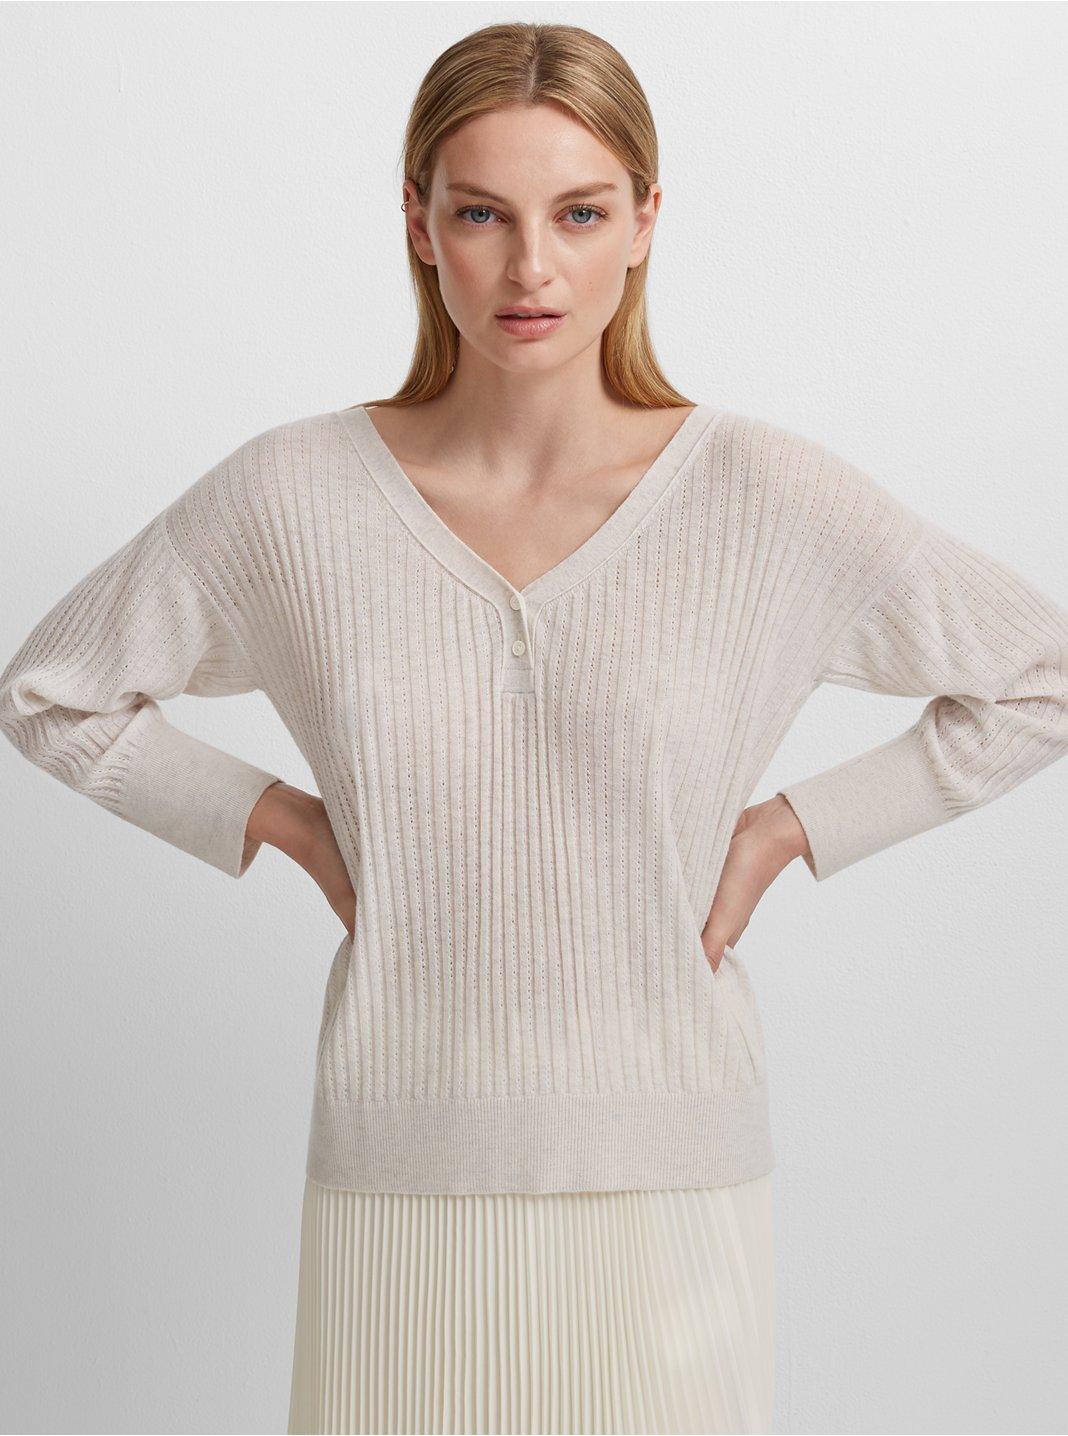 Candera Cashmere Sweater